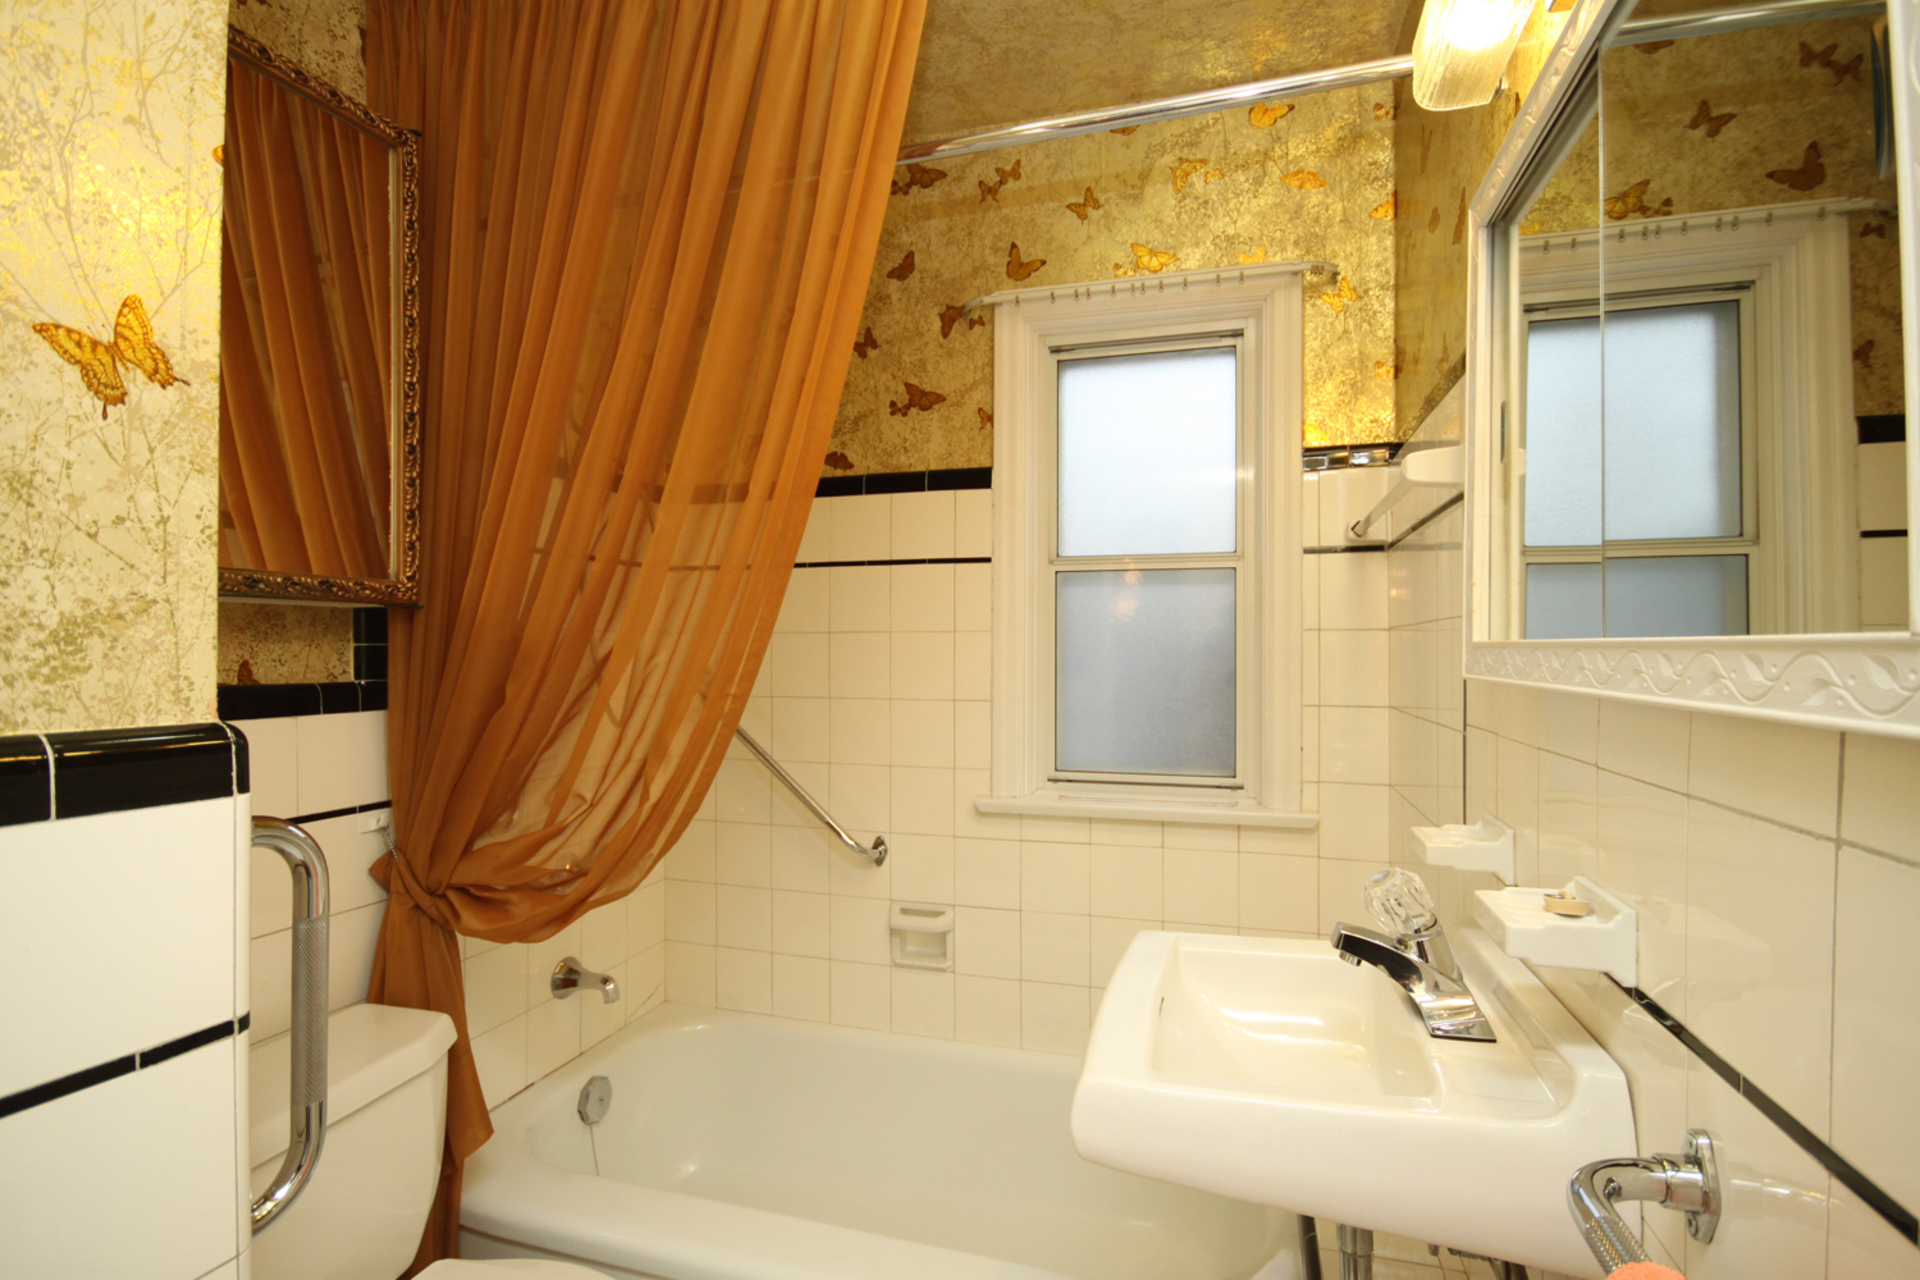 4 Piece Bathroom at 61 Marsh Road, Clairlea-Birchmount, Toronto